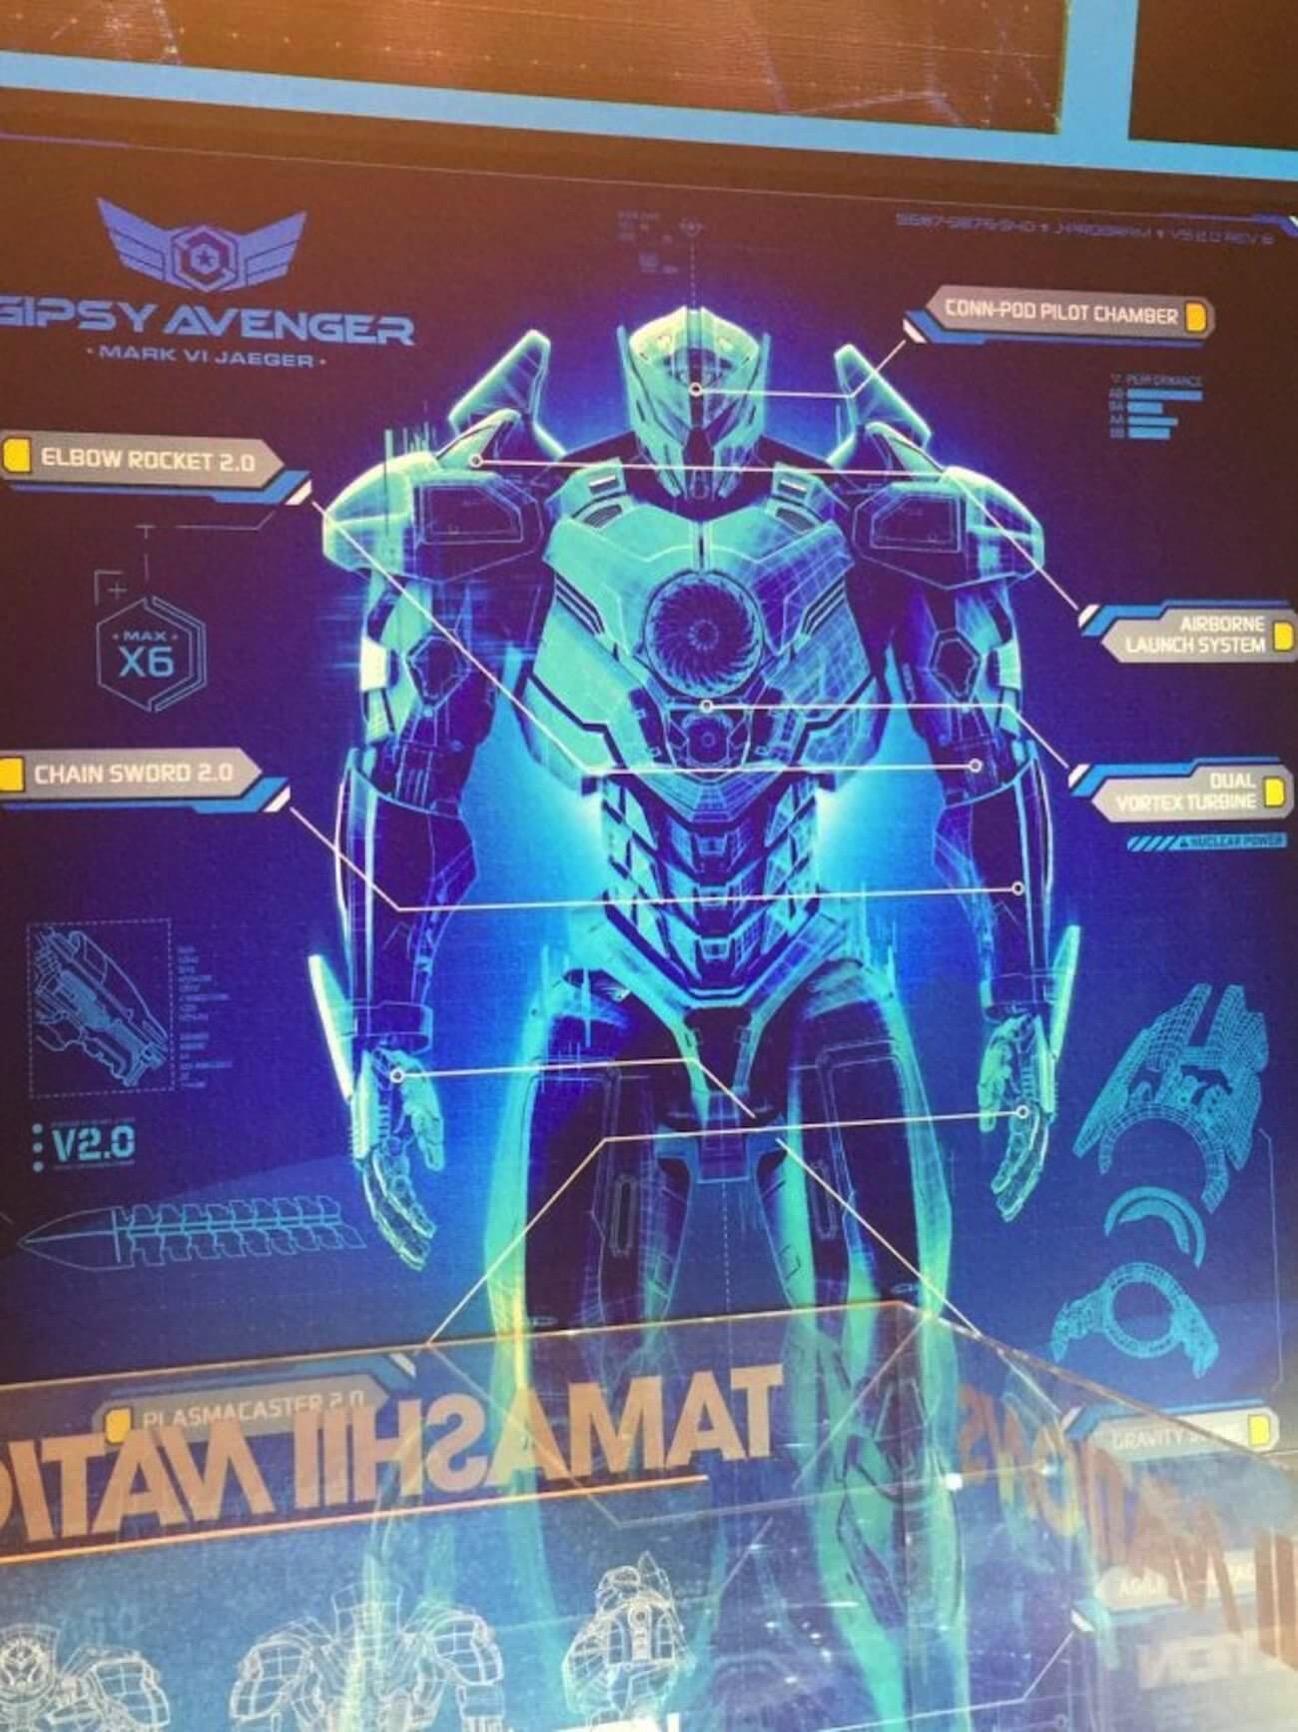 Pacificrim2 gipsyavenger toy blueprint1